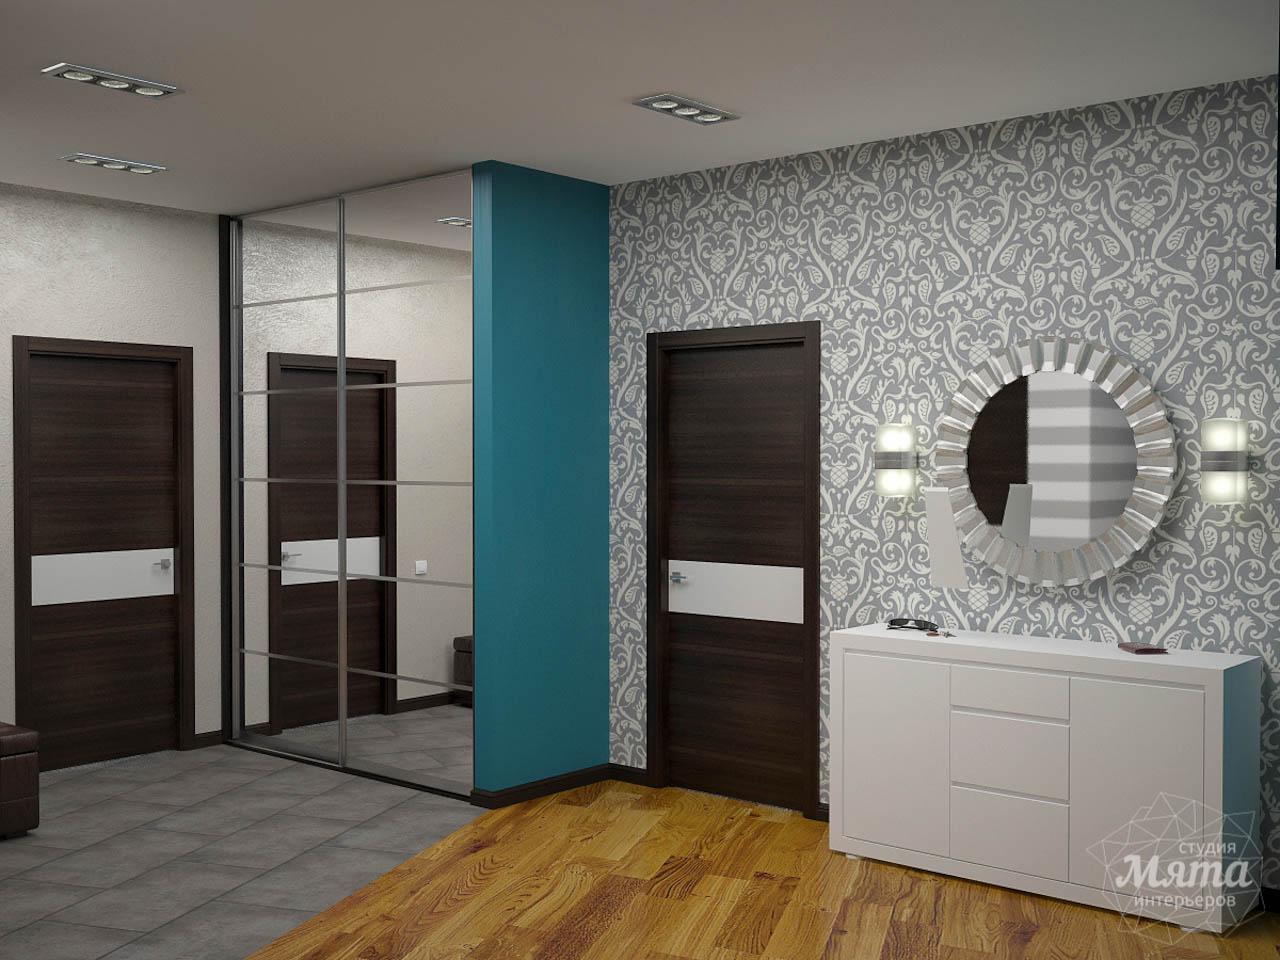 Дизайн проект интерьера коттеджа  в стиле минимализм по ул. Барвинка 15 img2065231989